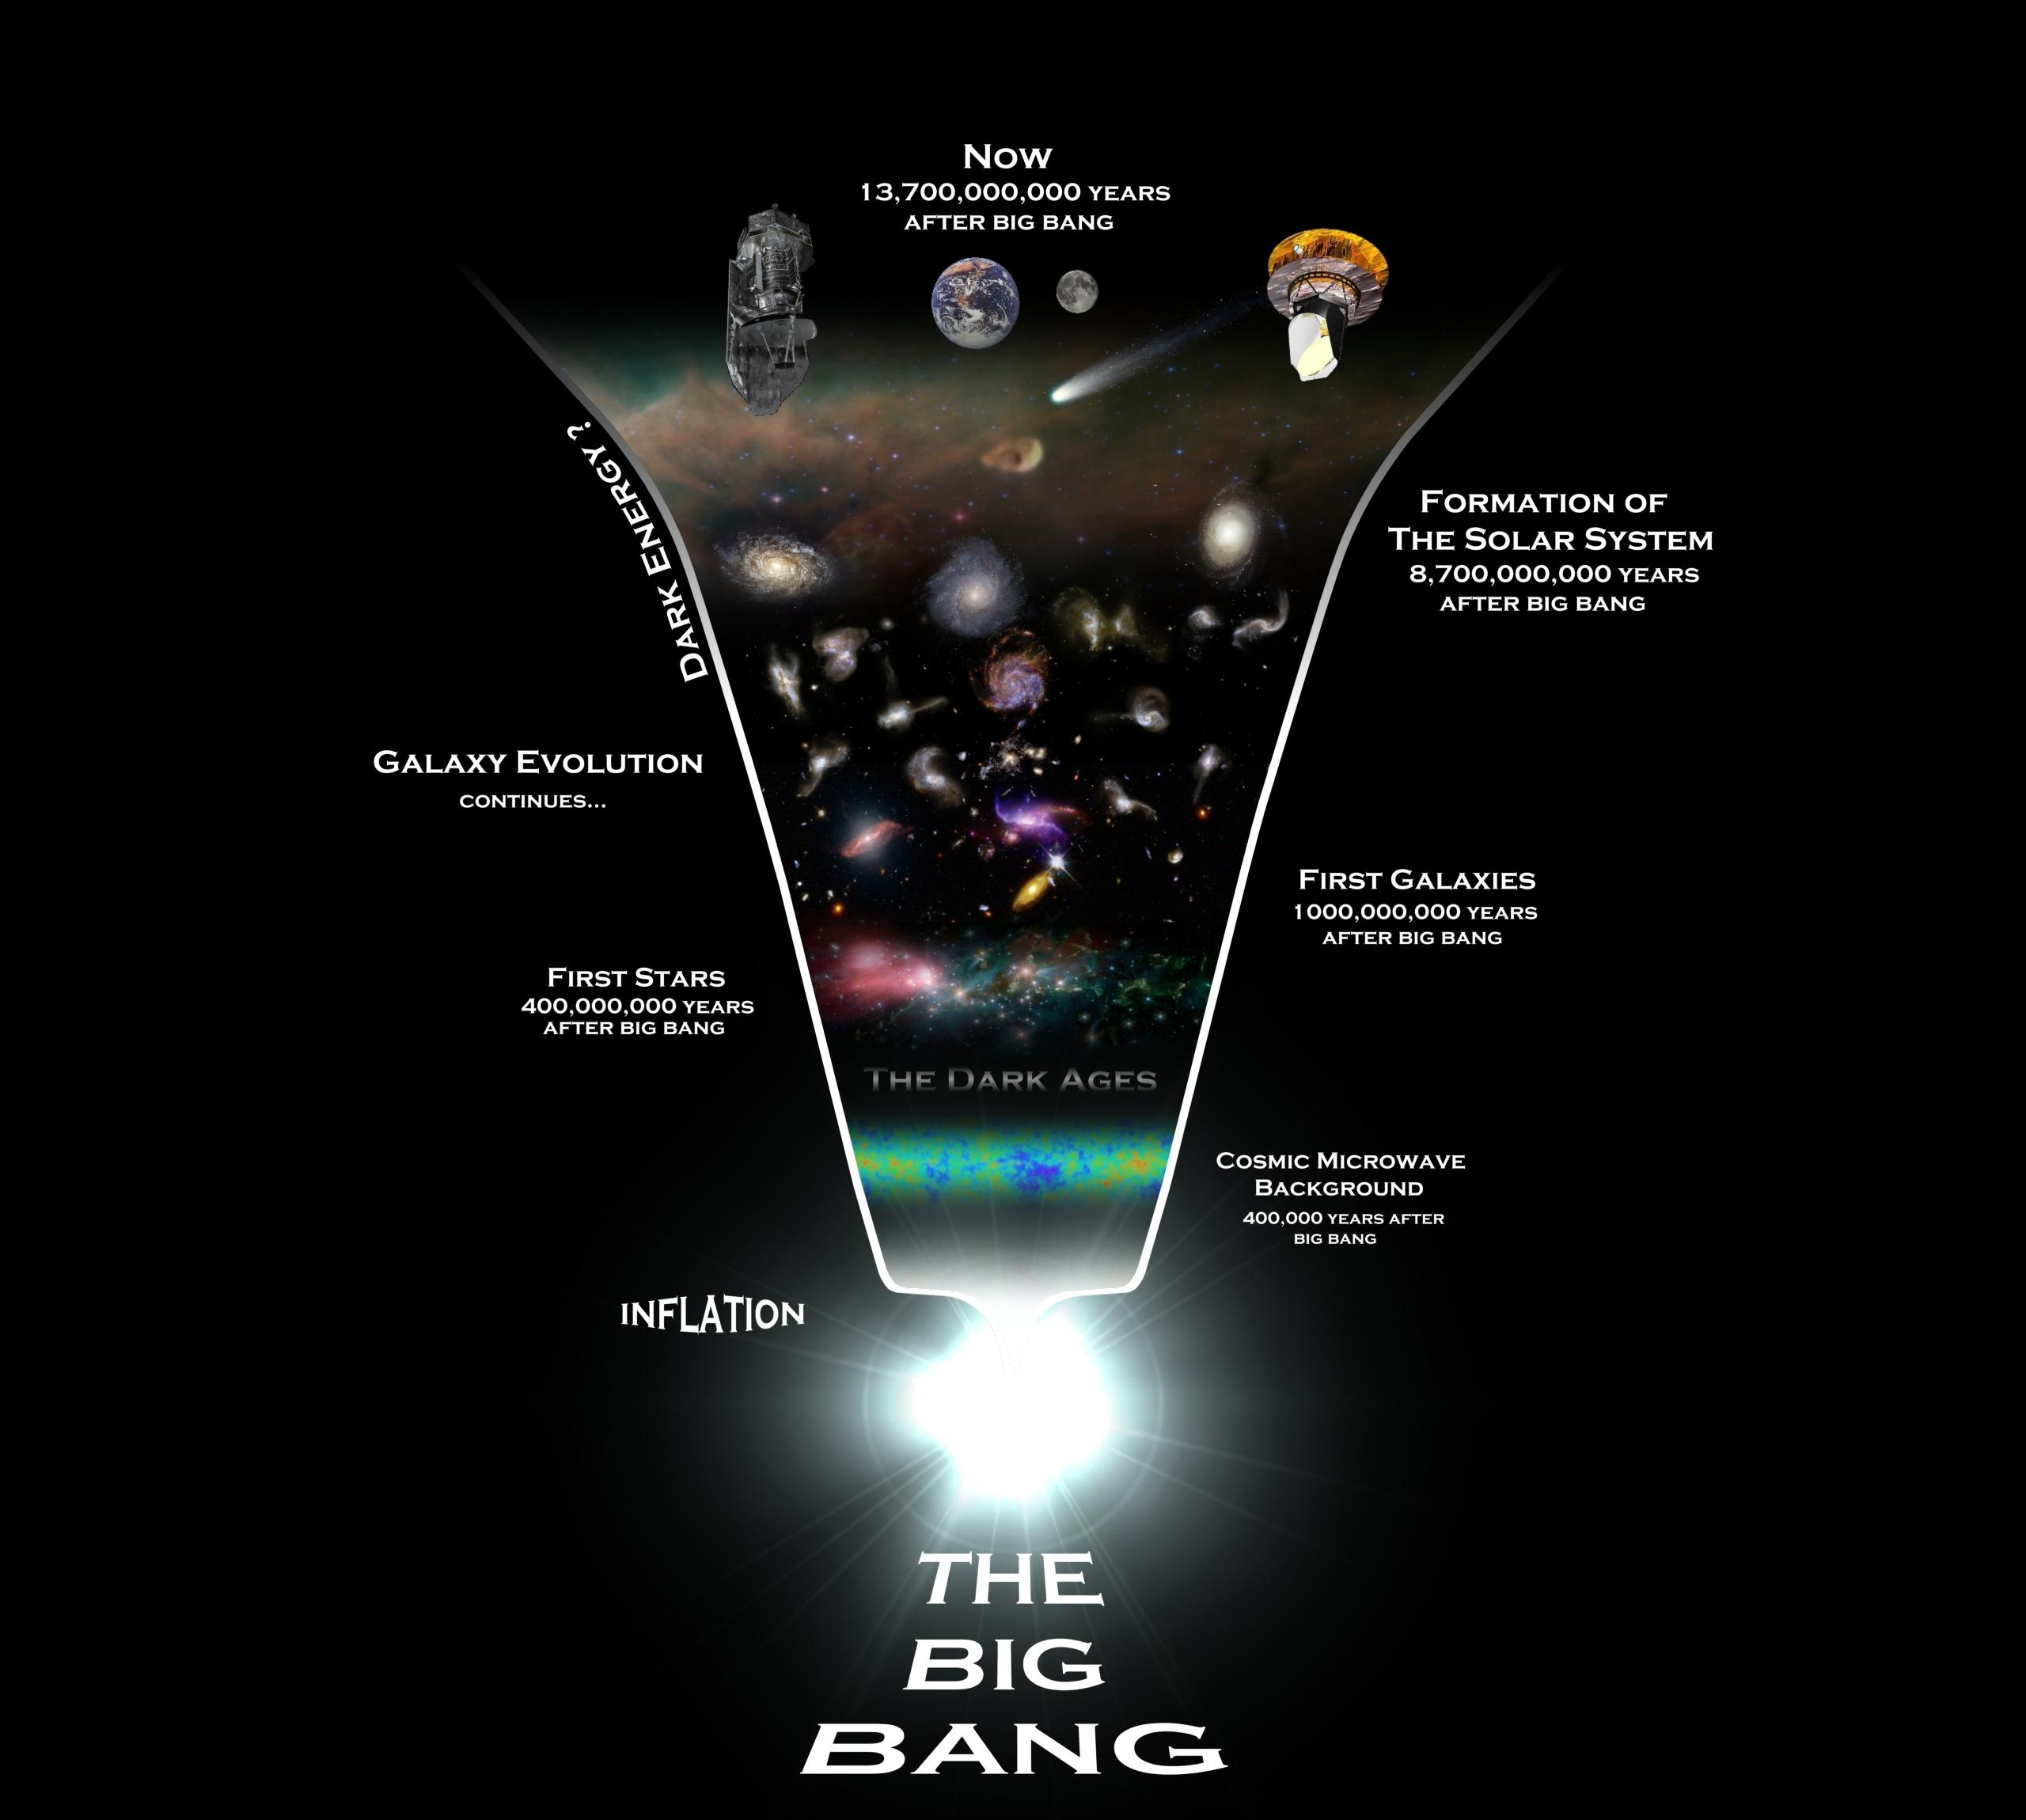 Universe_history